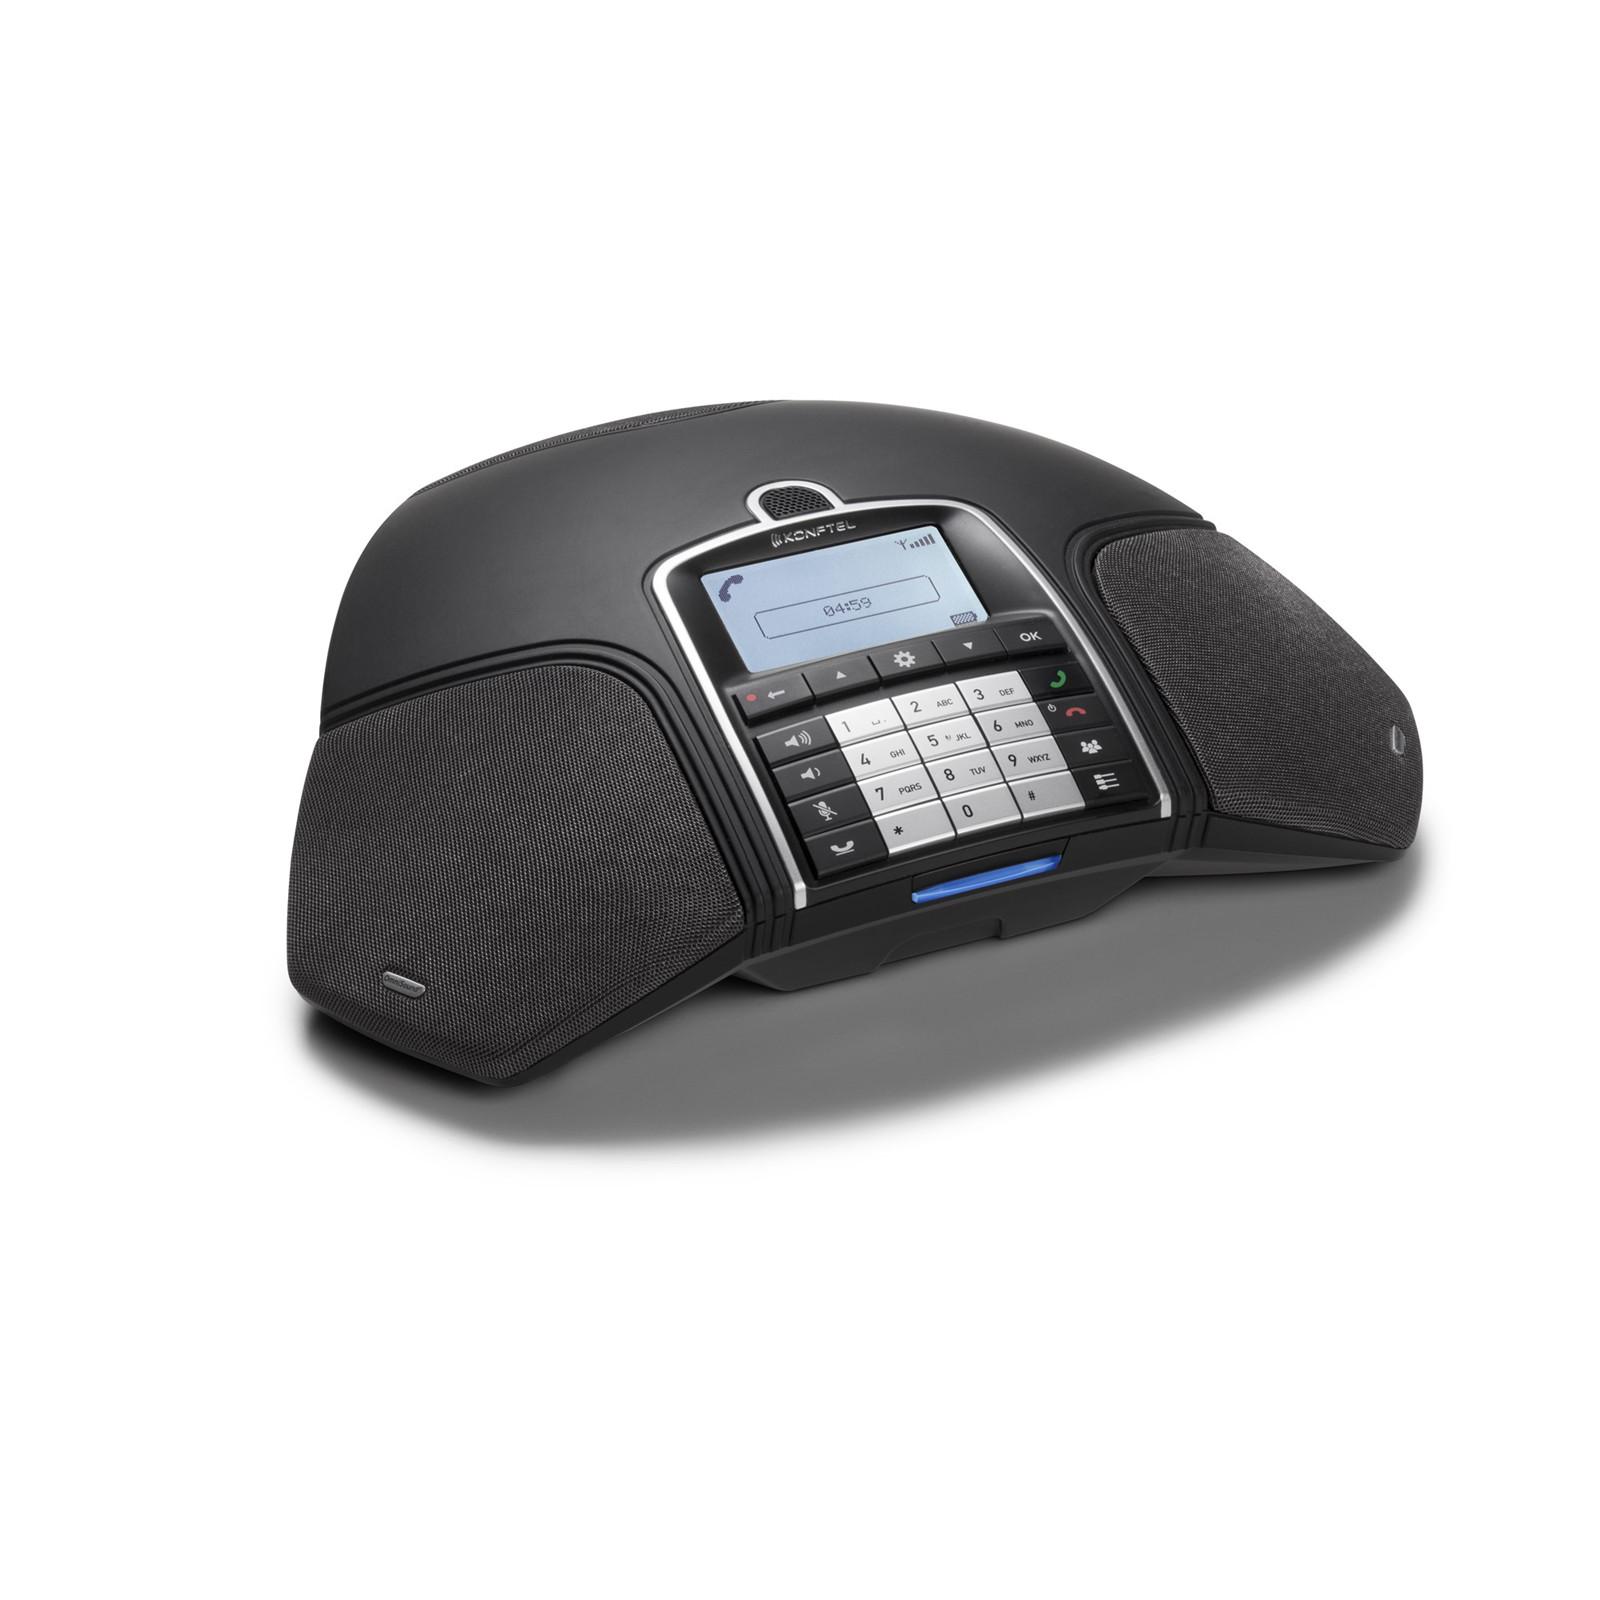 Buy the Konftel KONF 910101077 300Wx Wless Conf DECT ph w base ... b66ae6423e4c